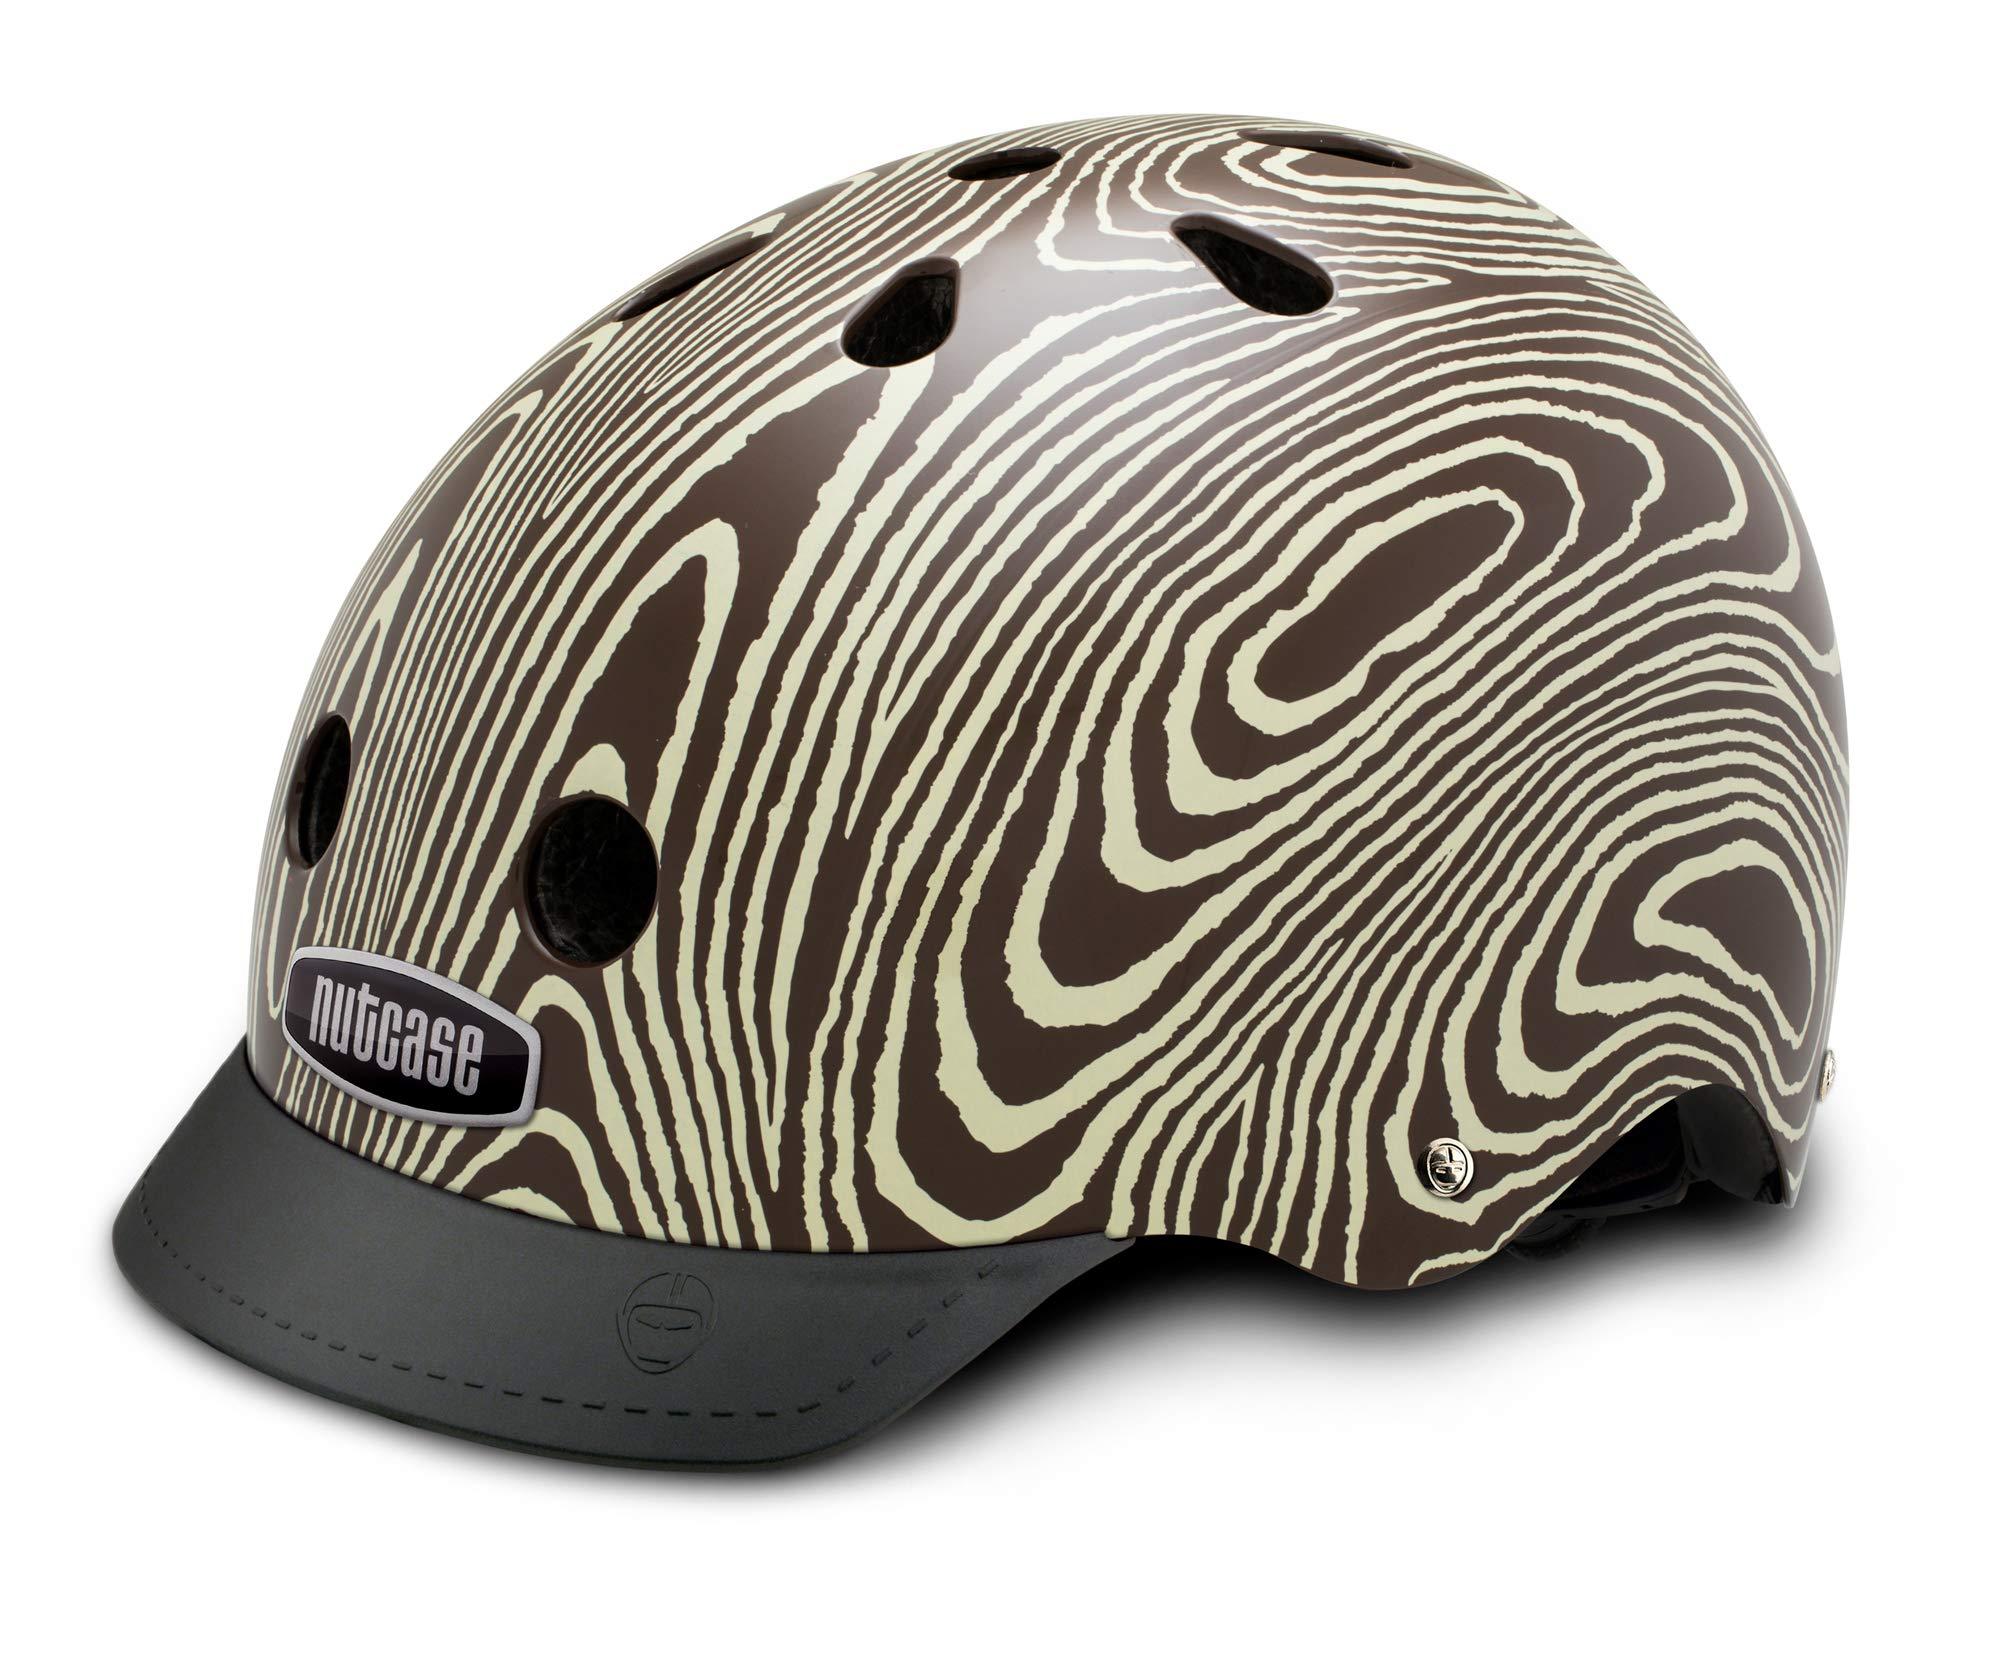 Nutcase - Patterned Street Bike Helmet for Adults, Tree Hugger, Large